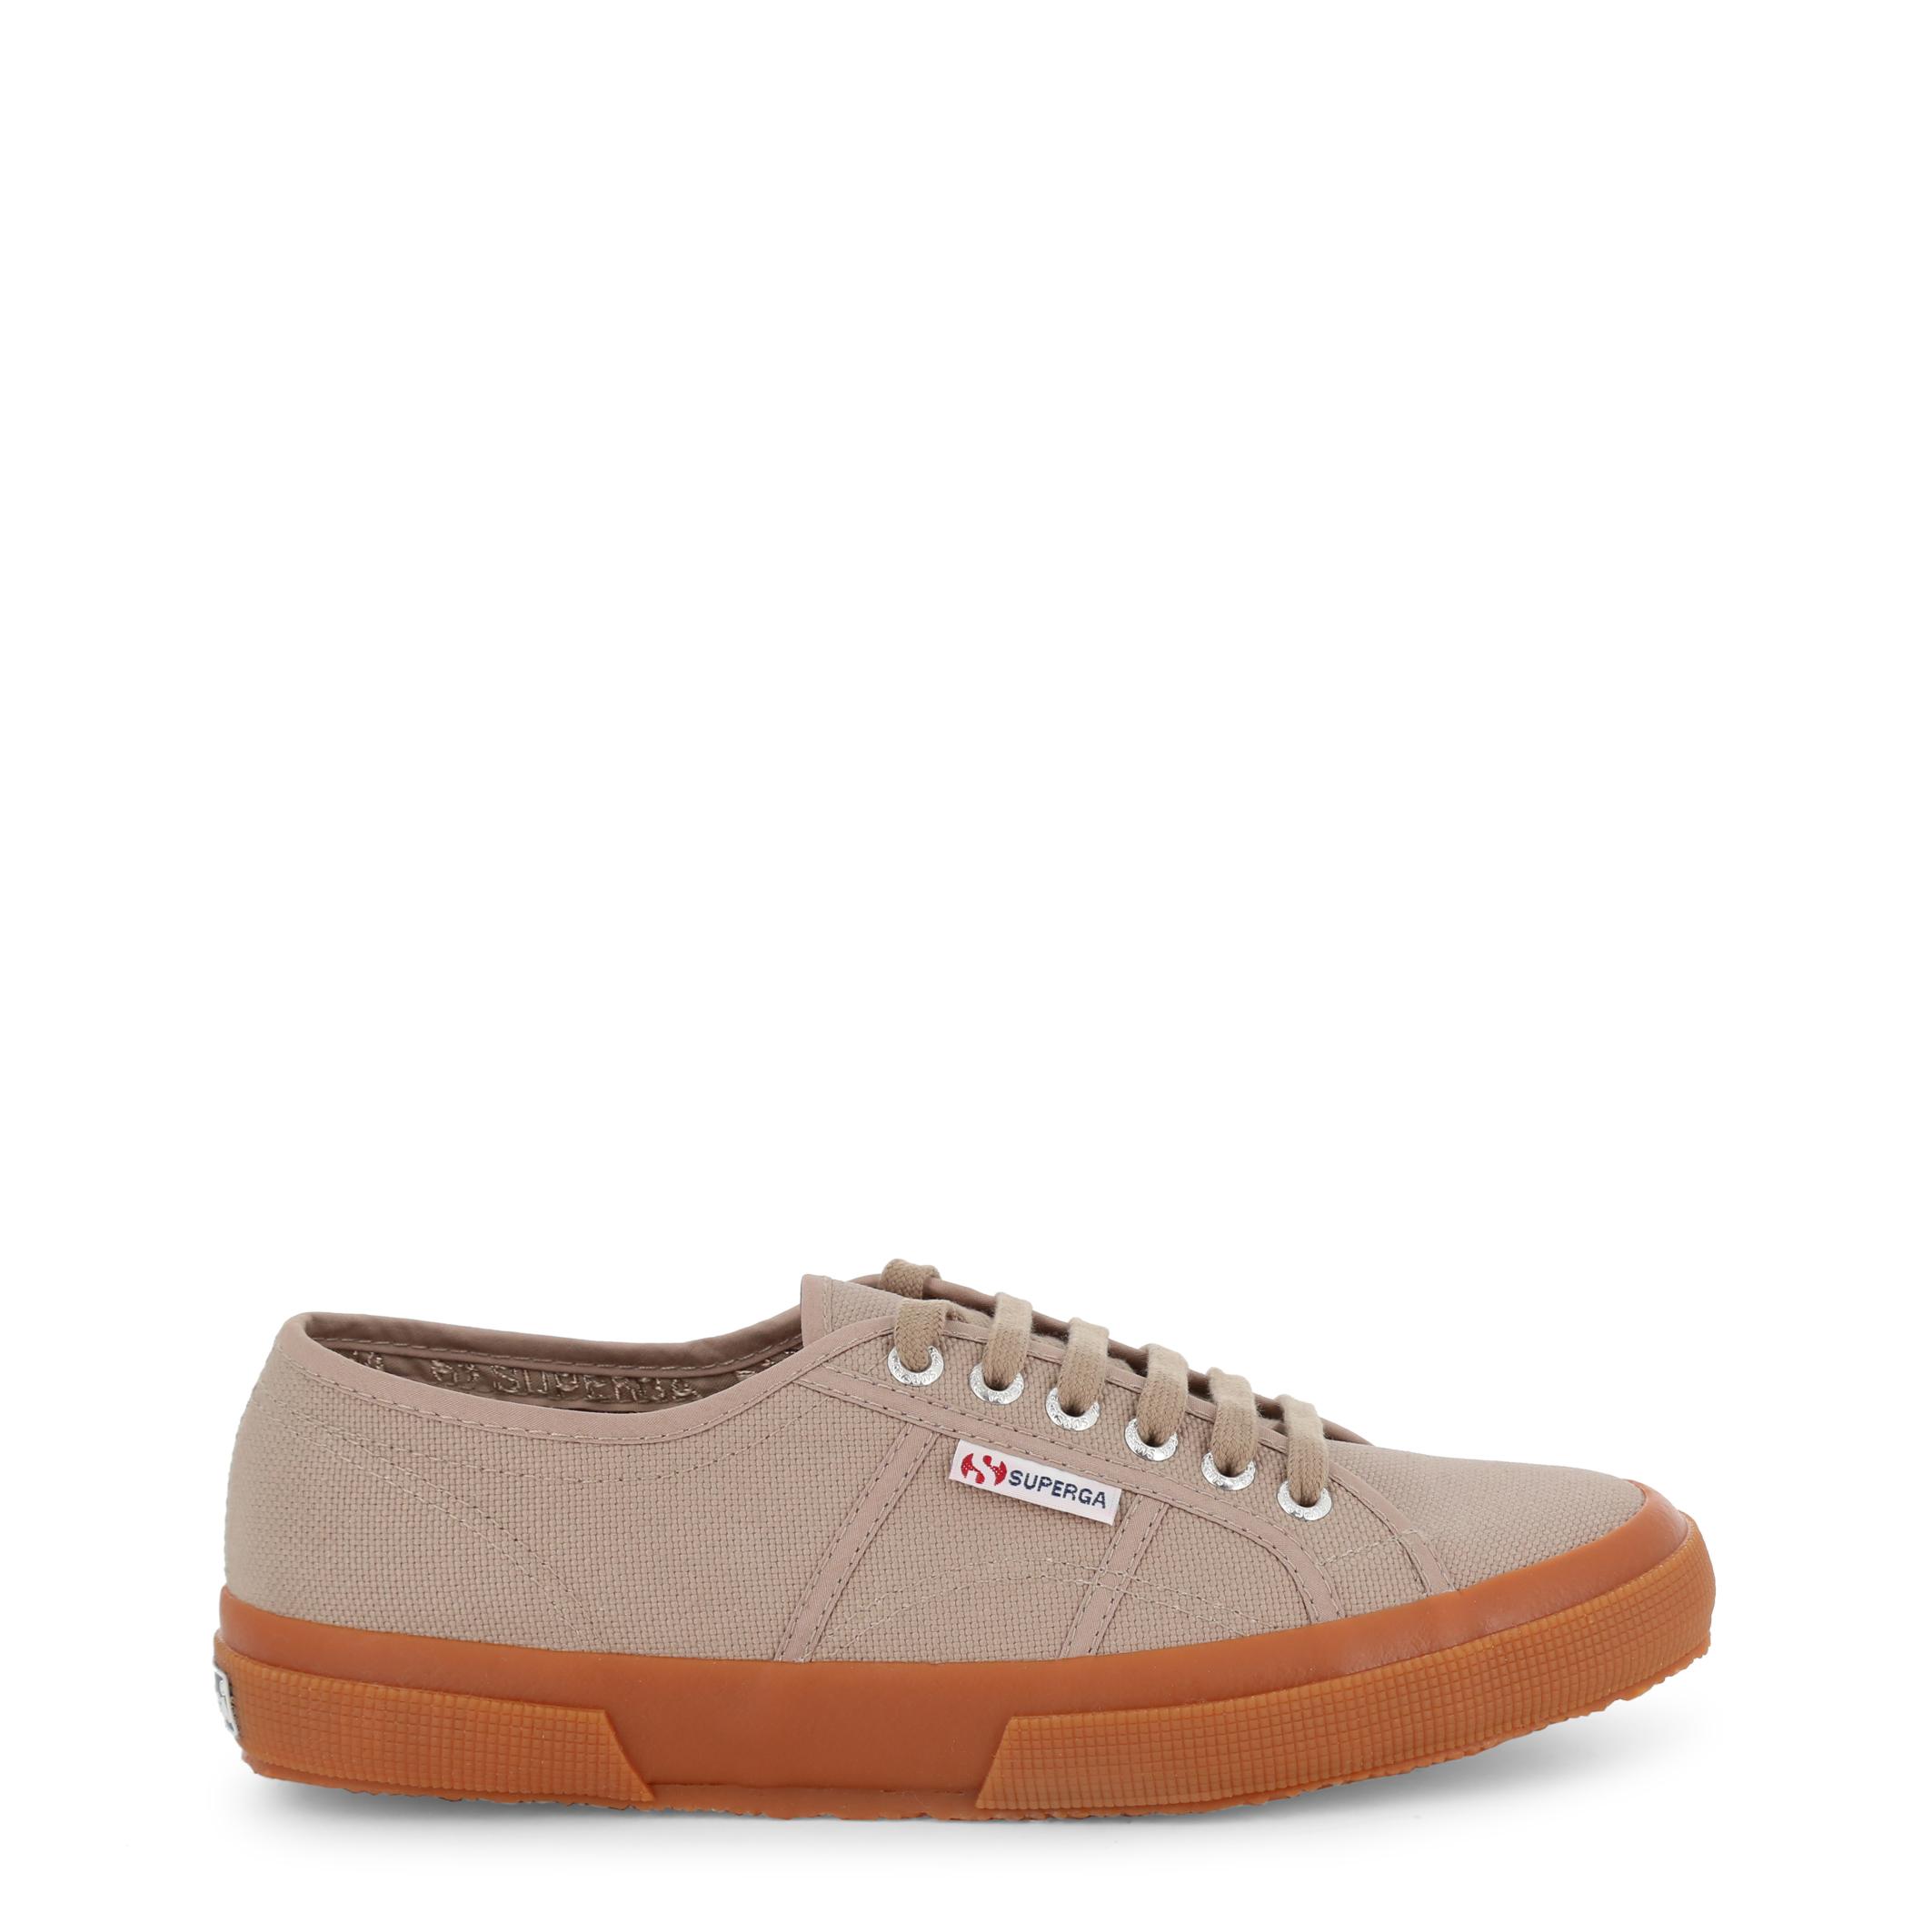 Chaussures de ville  Superga 2750-COTU-CLASSIC grey